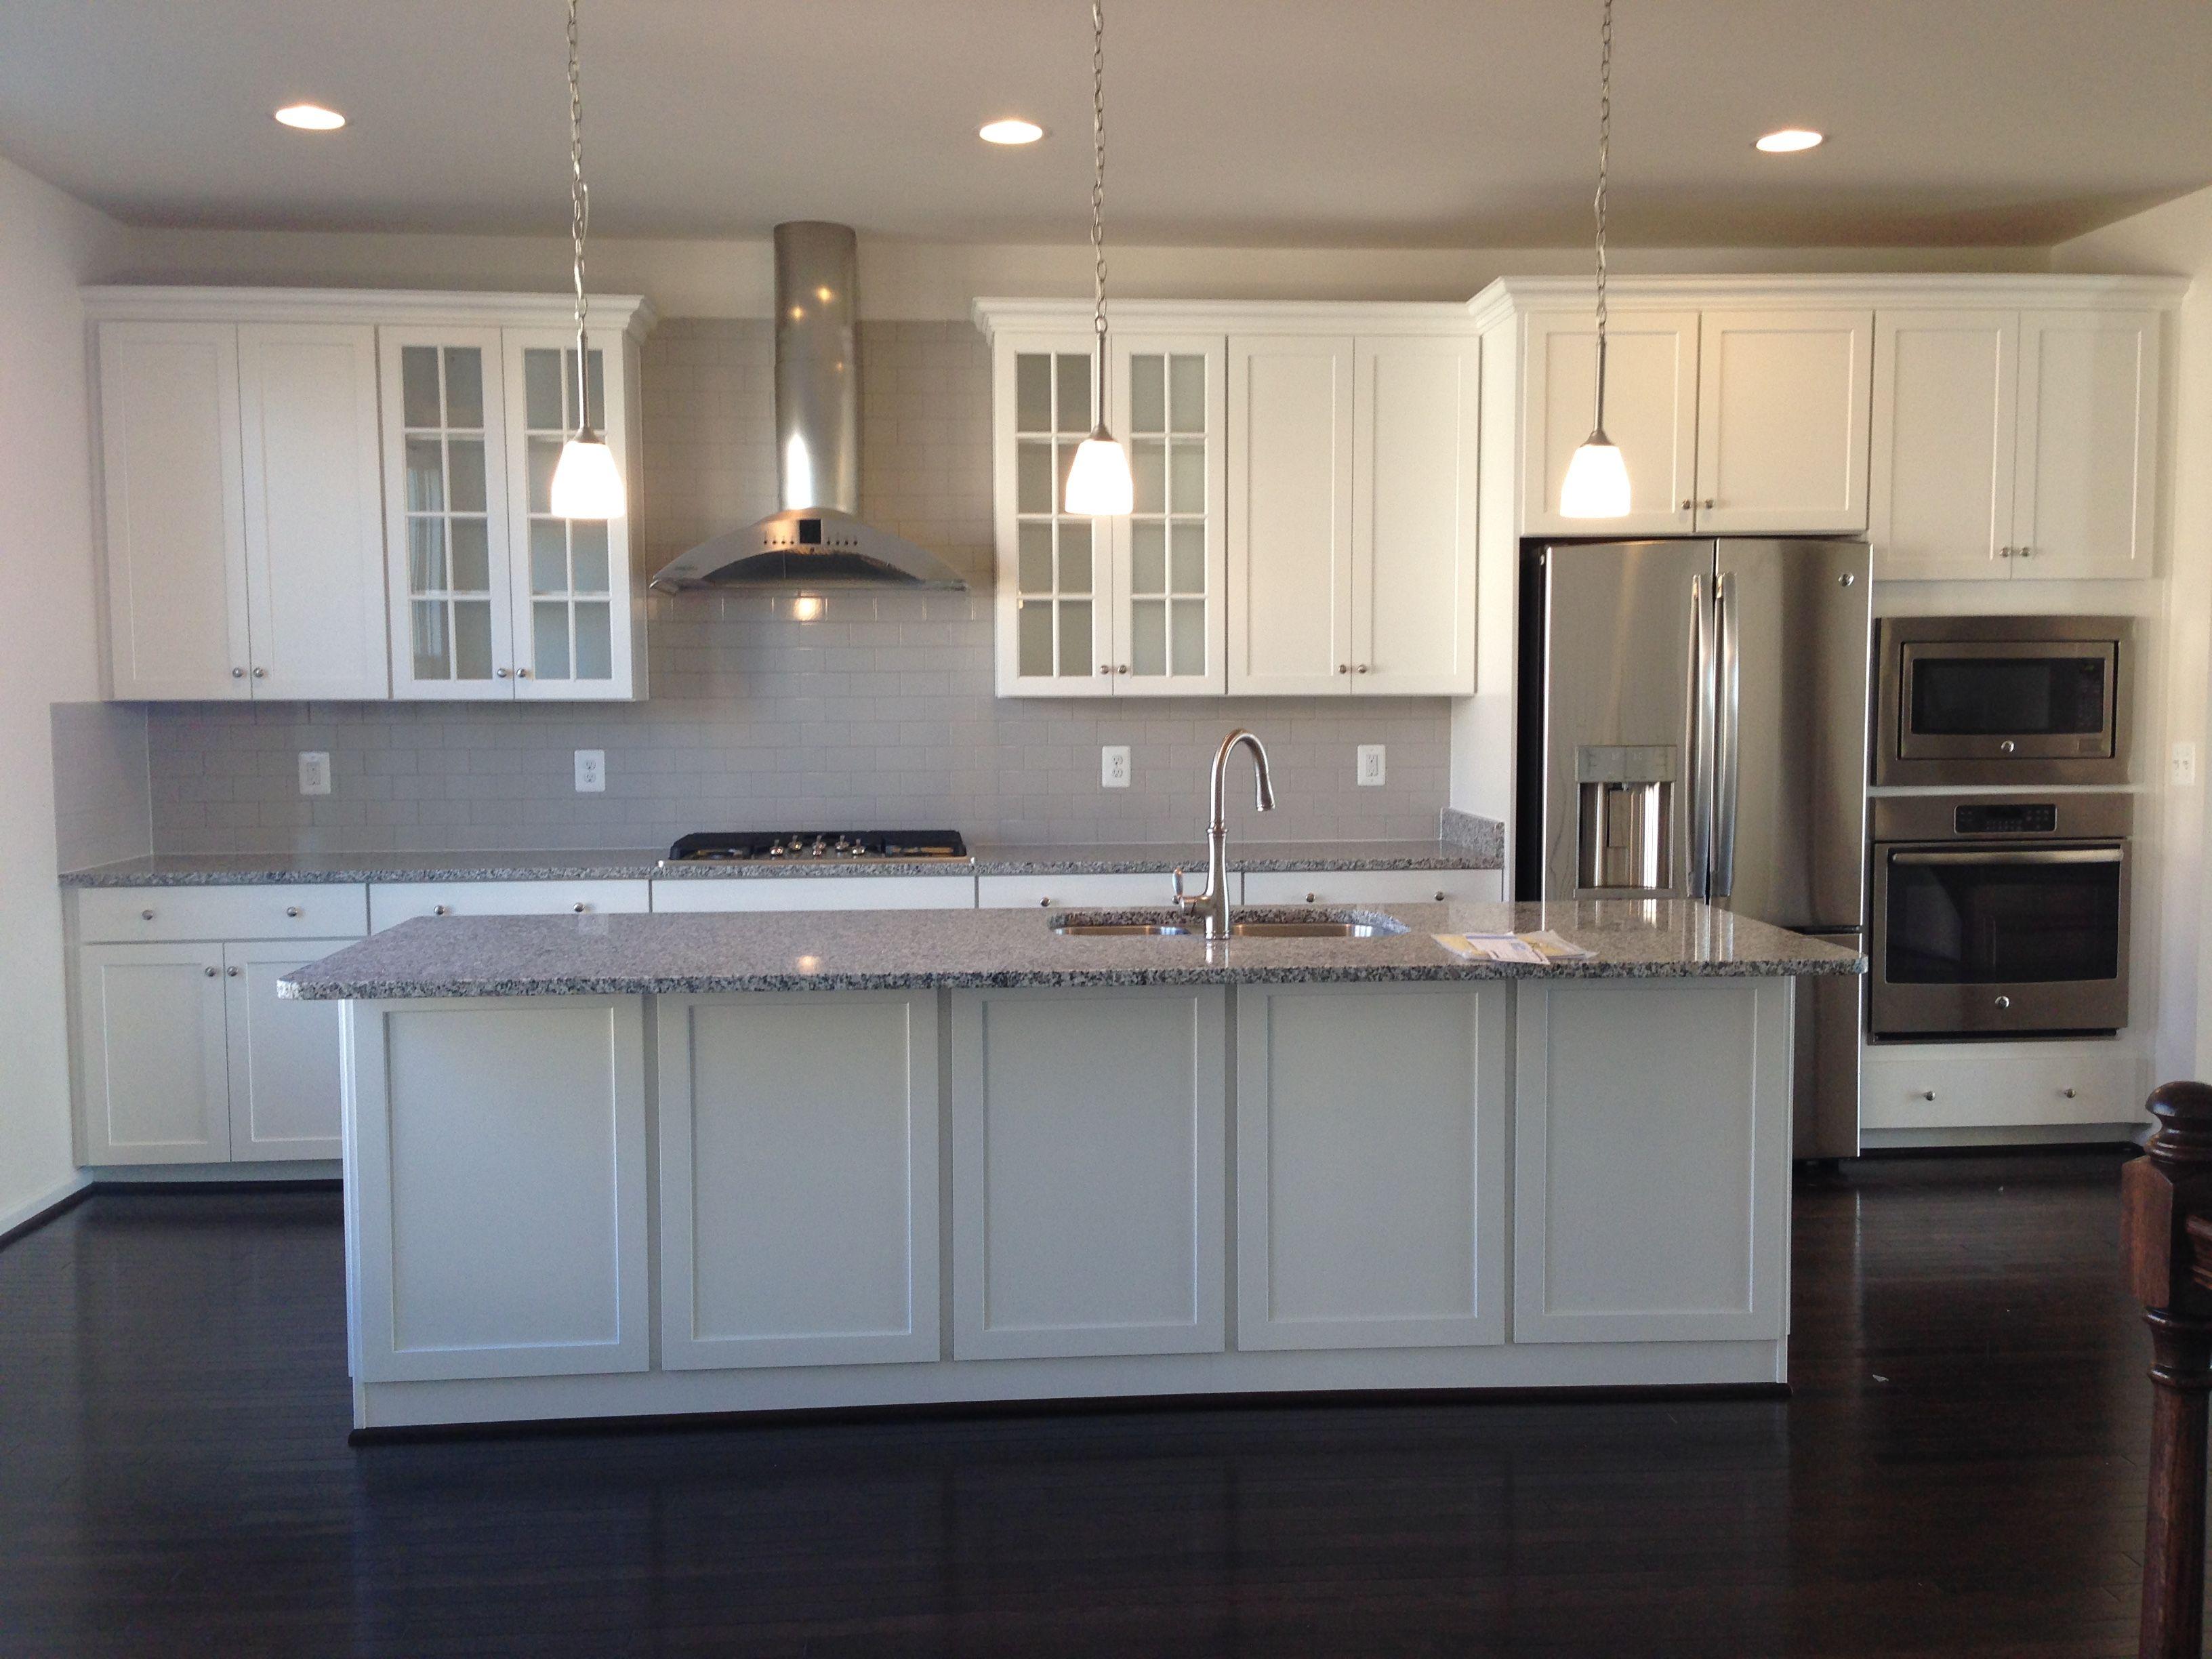 Level 1 Kitchen Backsplash Tender Gray In This Luxury